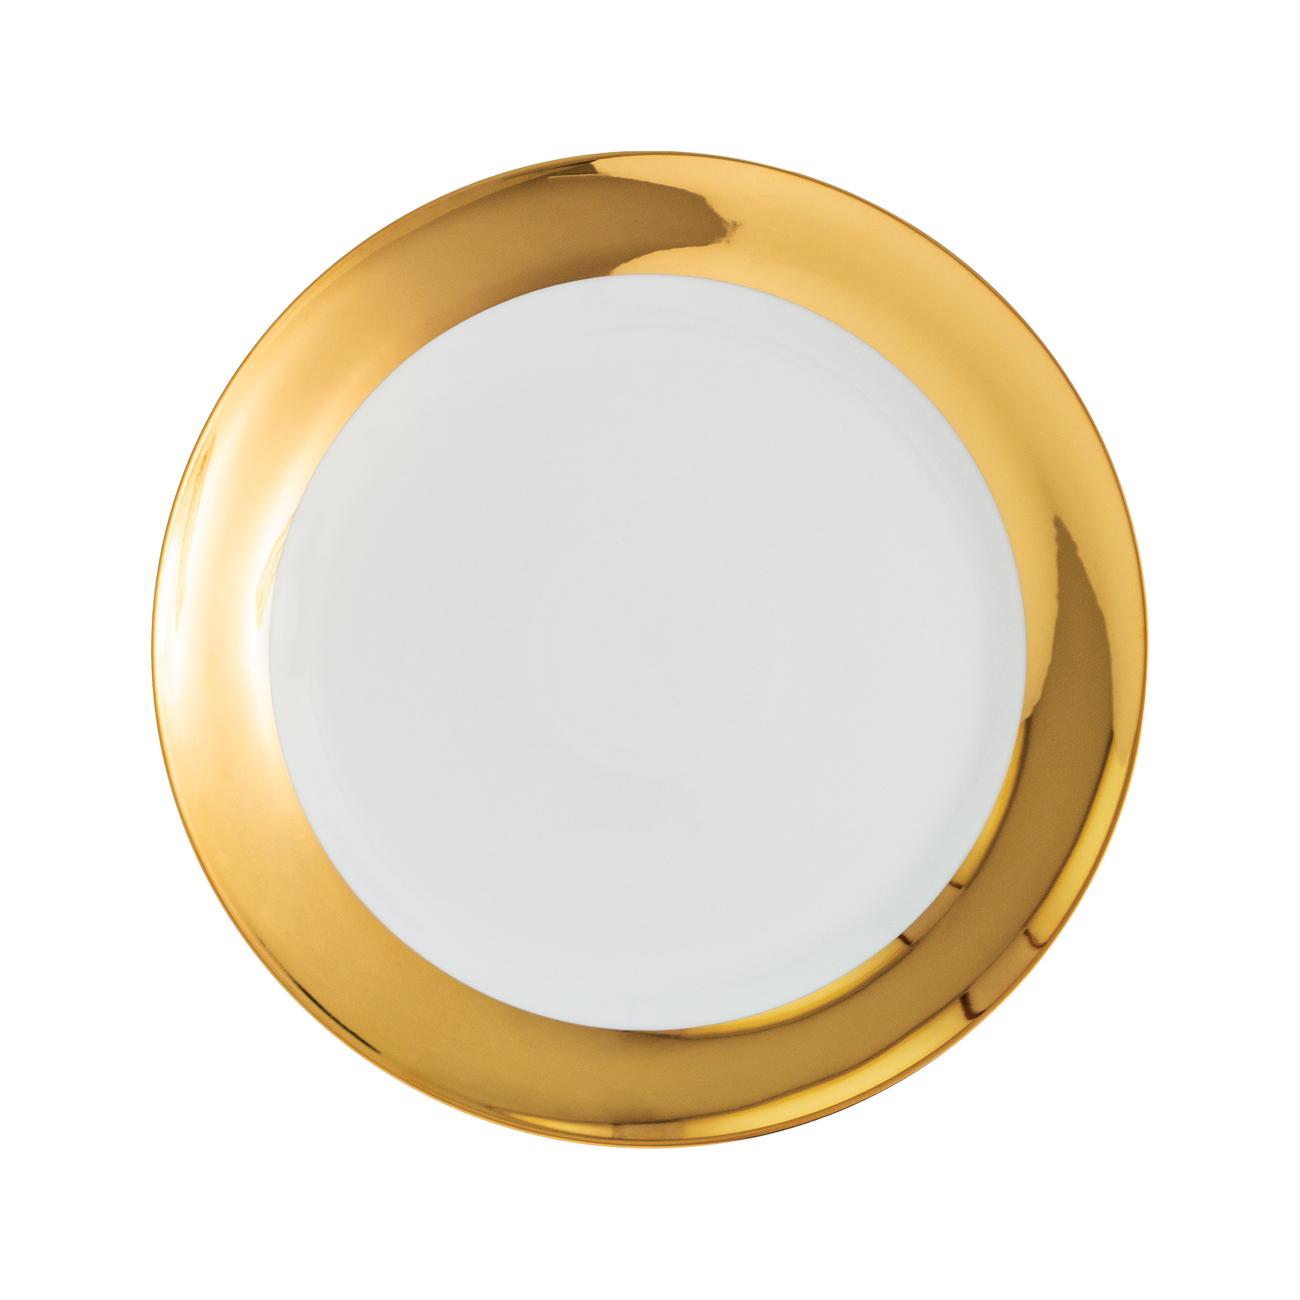 Premium Gold | Prato Marcador XL 32 Viena 1